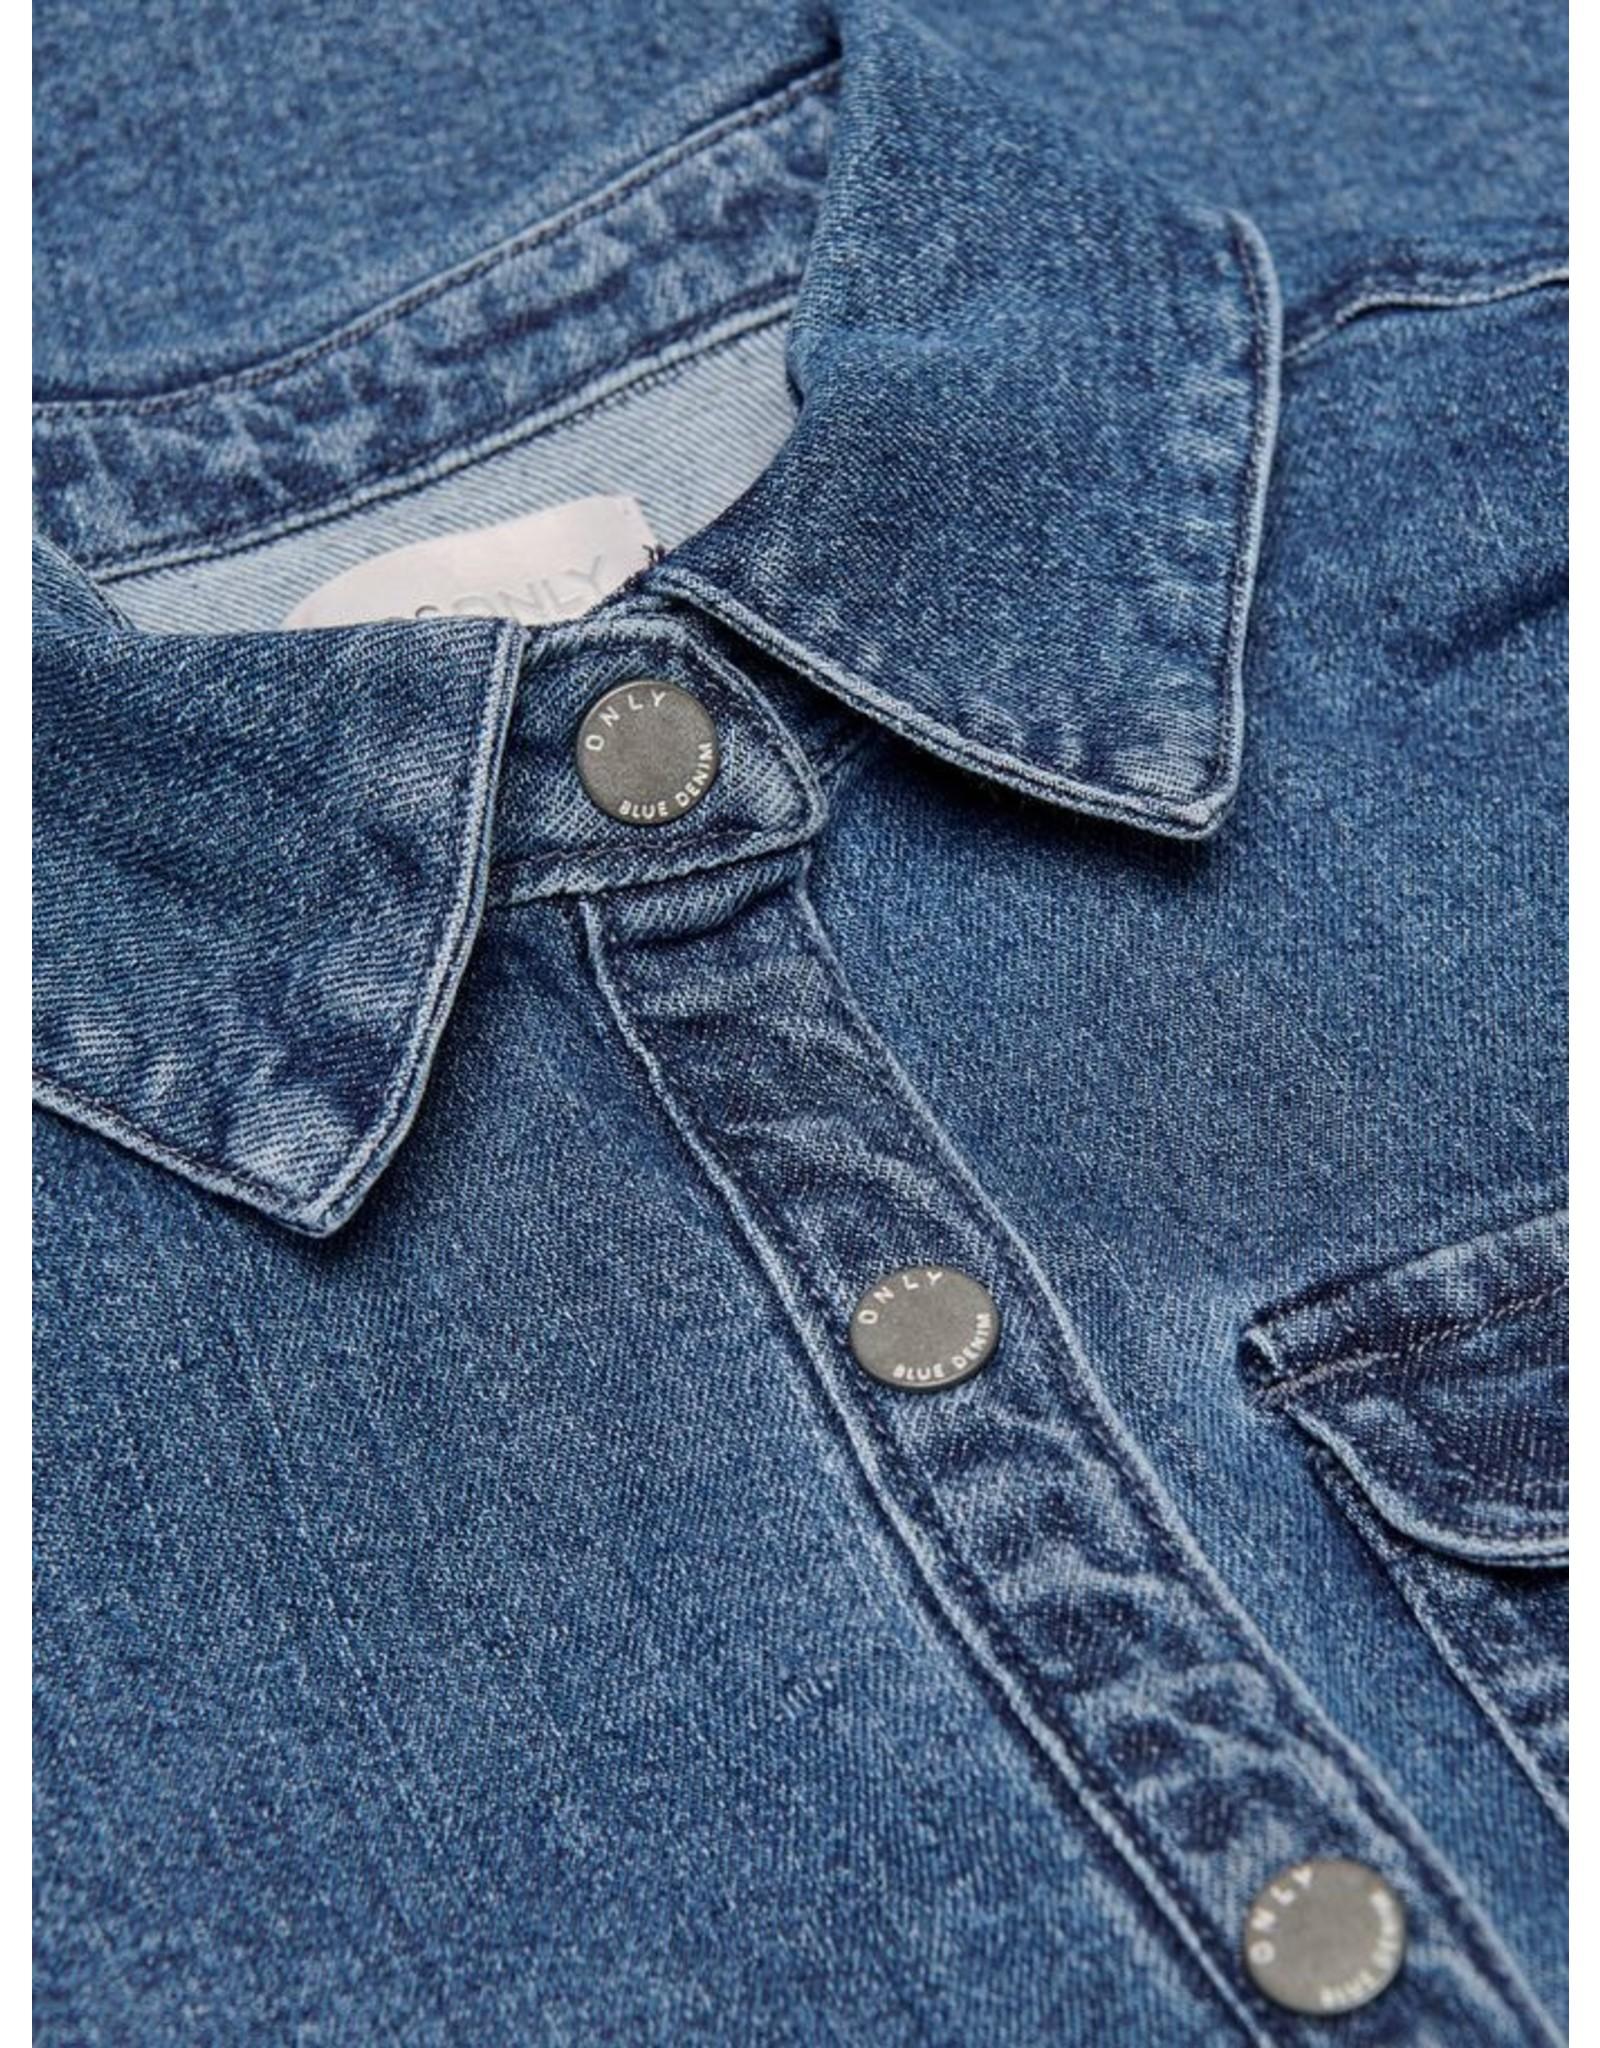 KIDS ONLY Jeans kleedje met zakjes - LAATSTE MAAT 164